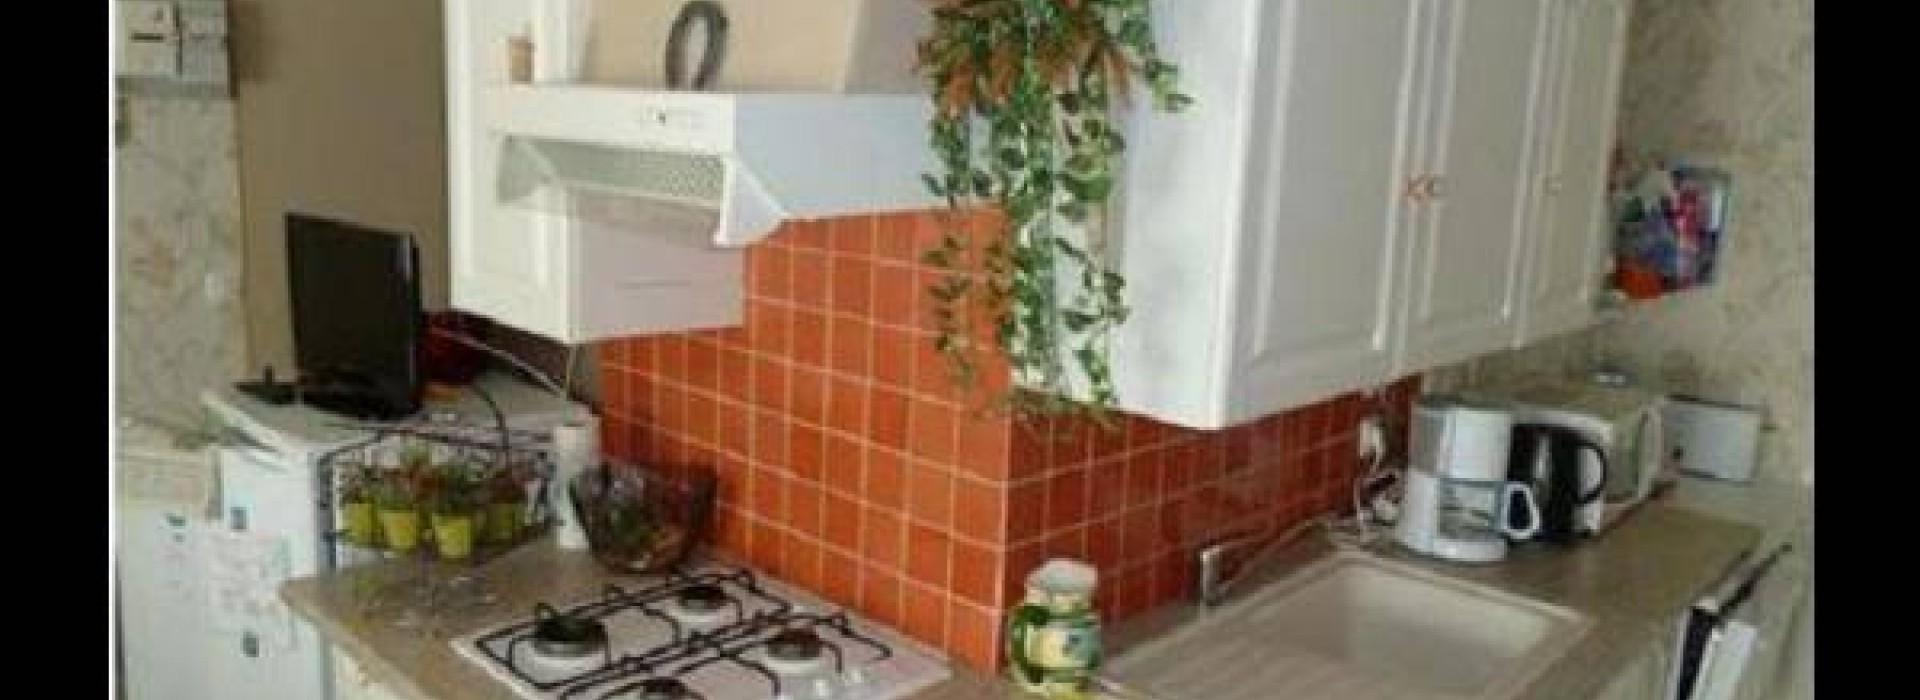 appartement en rez de chaussee a saint hilaire de riez vakantiehuisje accommodatie en verhuur. Black Bedroom Furniture Sets. Home Design Ideas